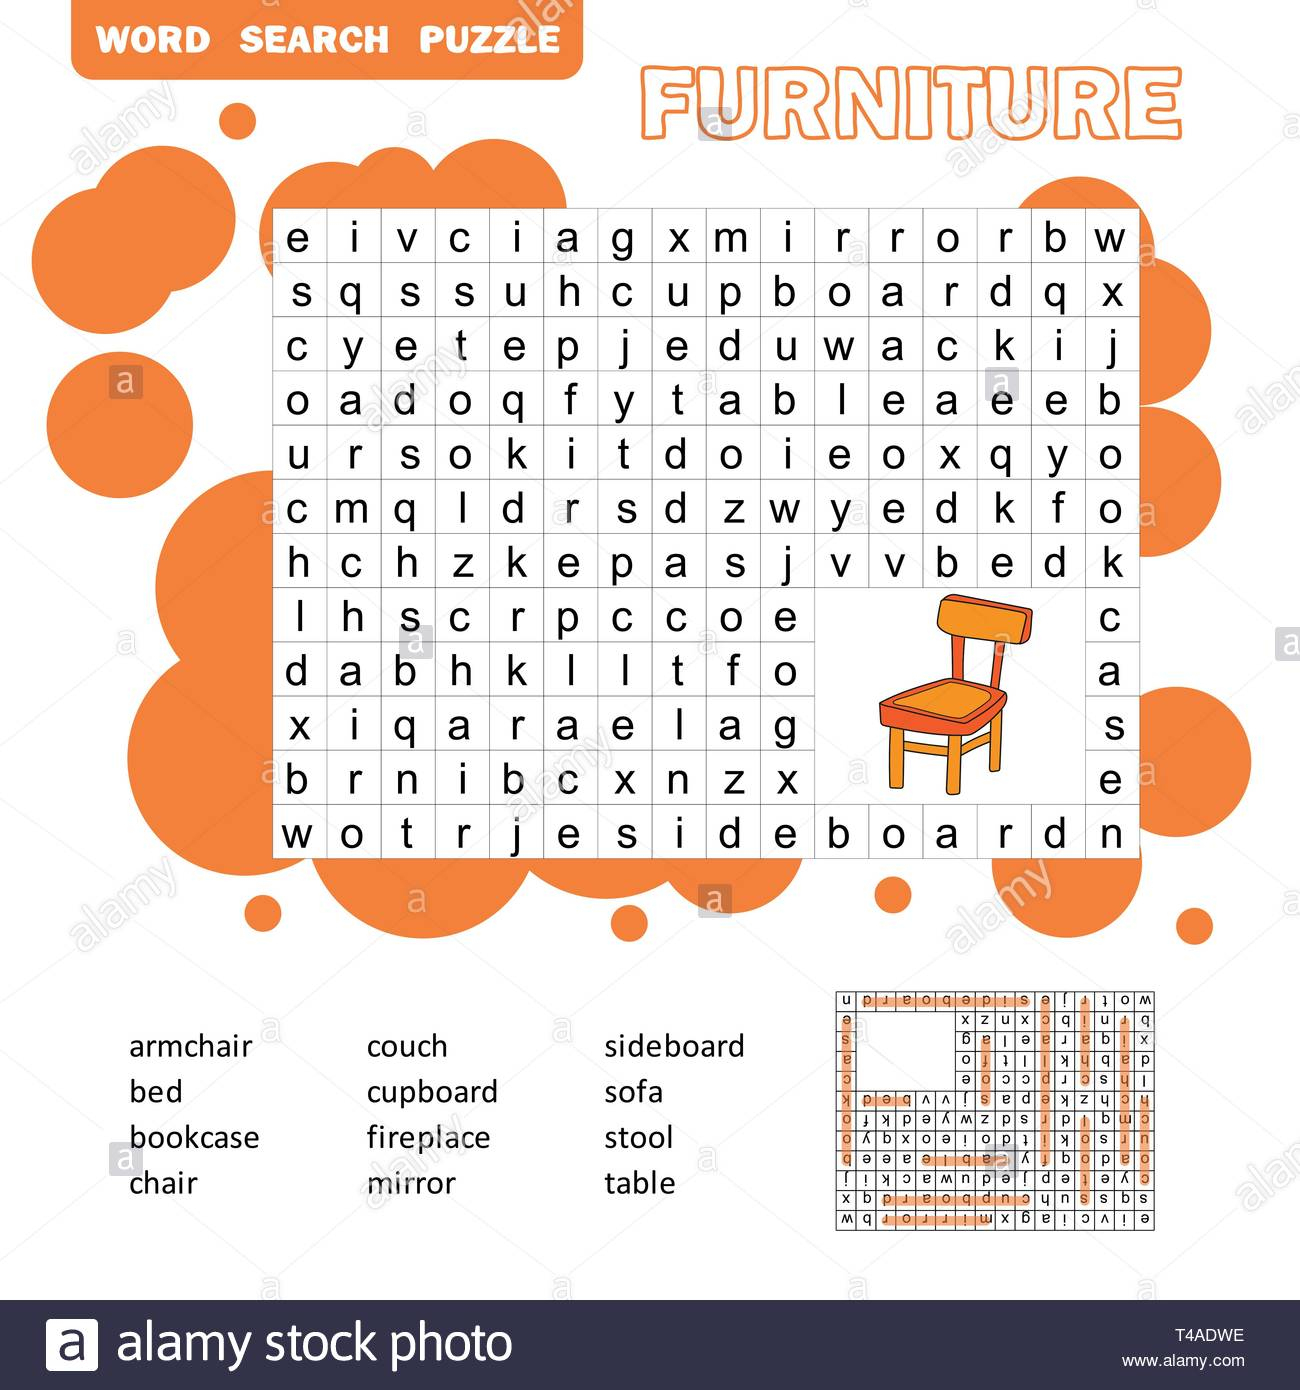 Crossword - Living Room Furniture - Learning English Words. Word - Printable Crosswords For Learning English